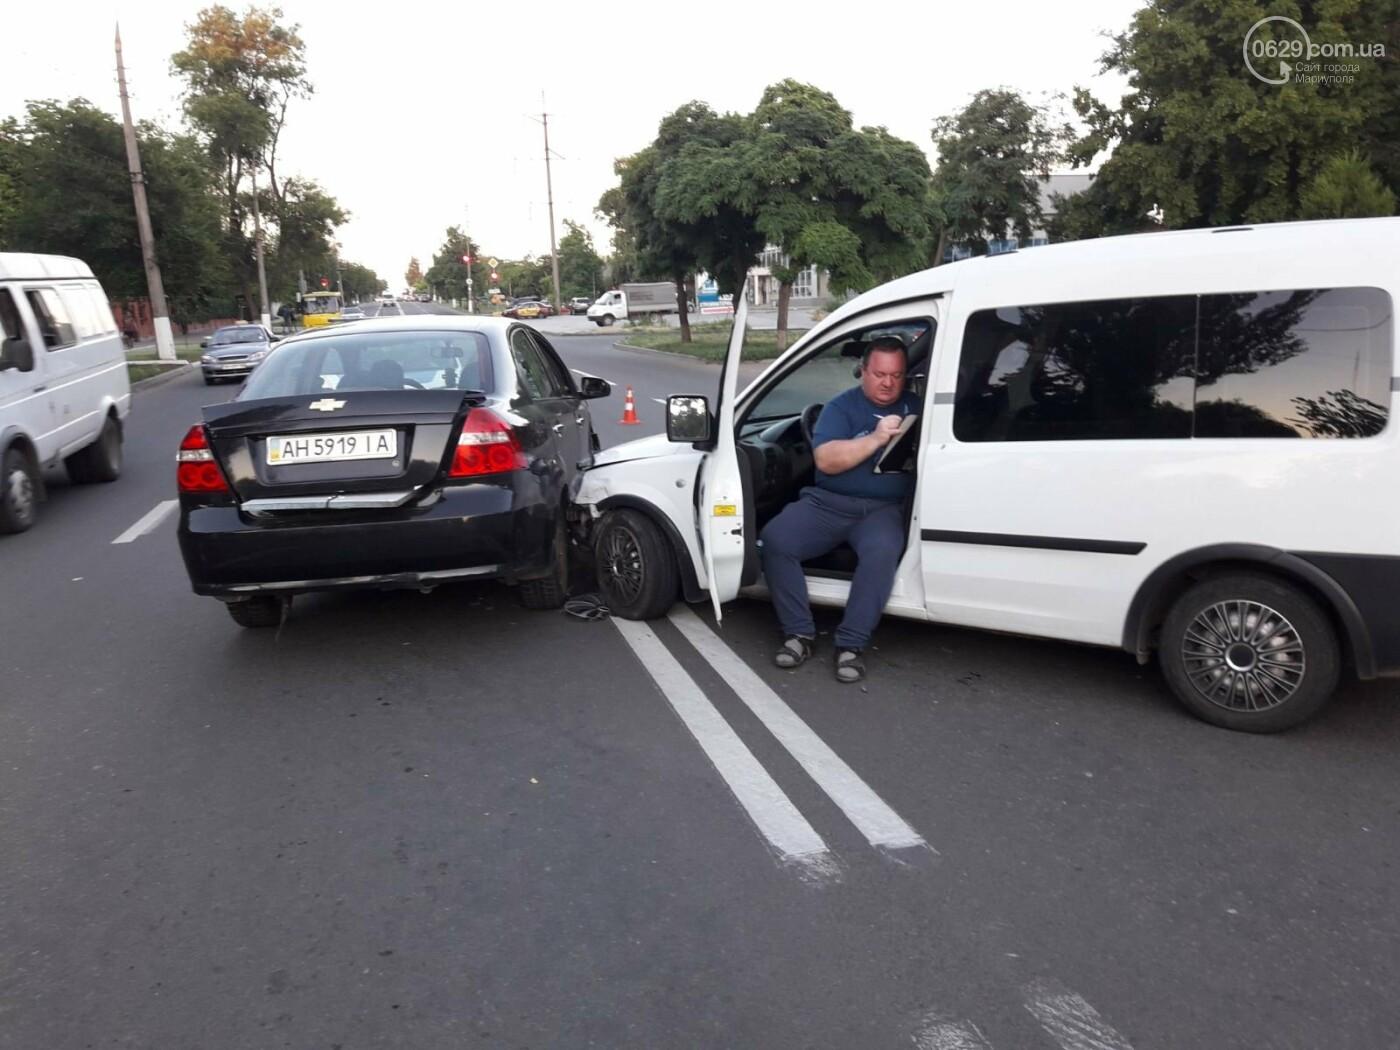 Дубль два! На Митрополитской снова столкнулись два авто, - ФОТО, фото-2